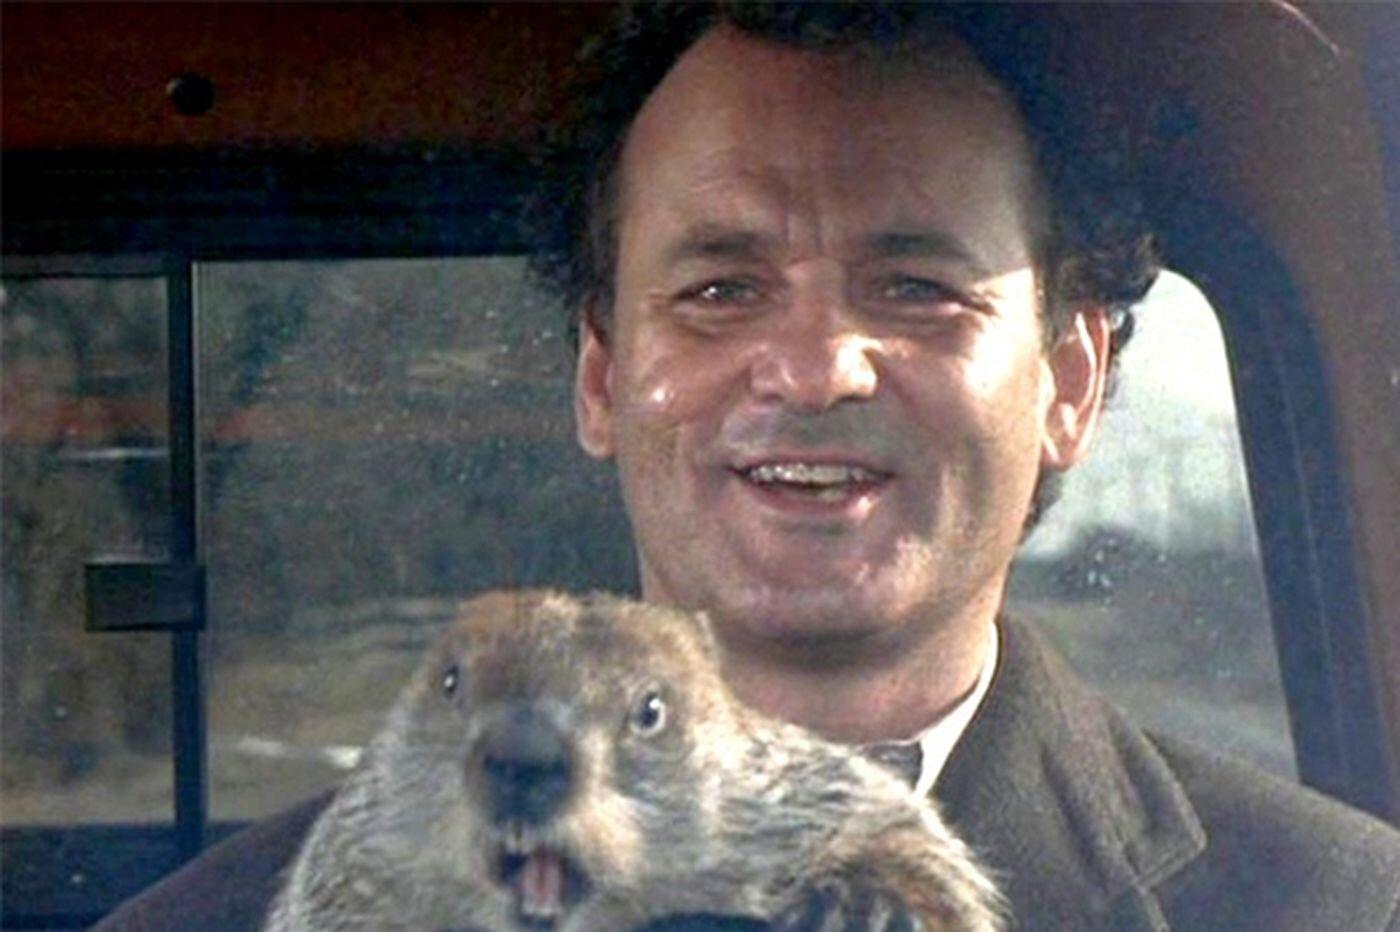 No!  Not Groundhog Day!